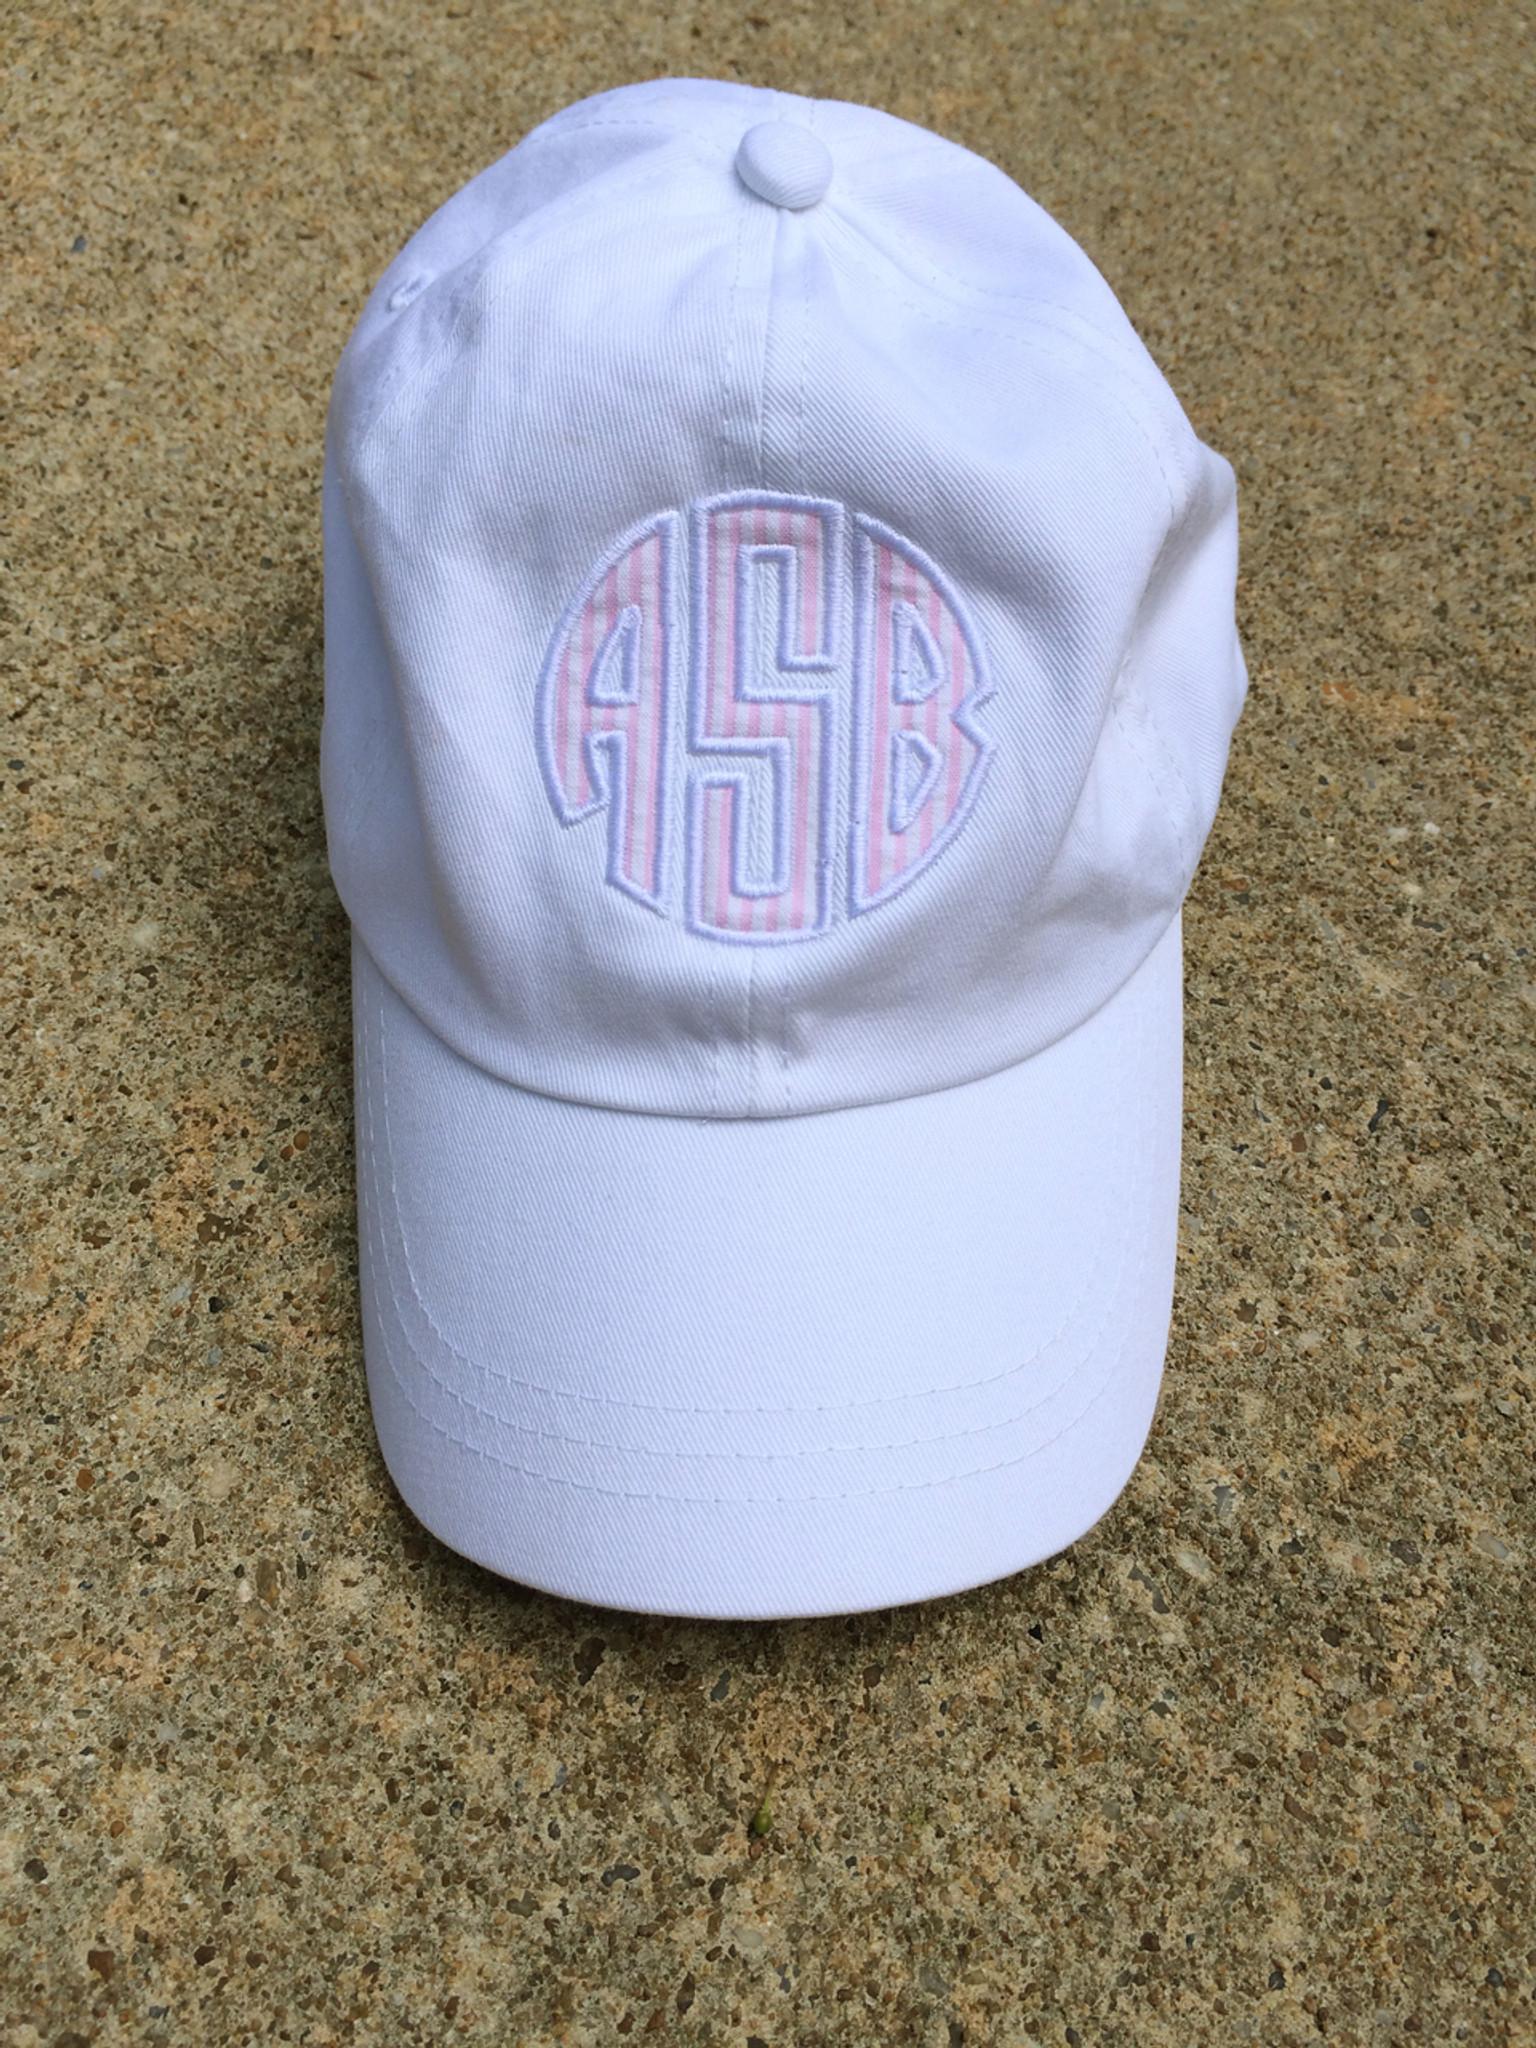 568a77c98bd Monogrammed Seersucker Applique Baseball Hat www.tinytulip.com White Hat  with Pink Seersucker and